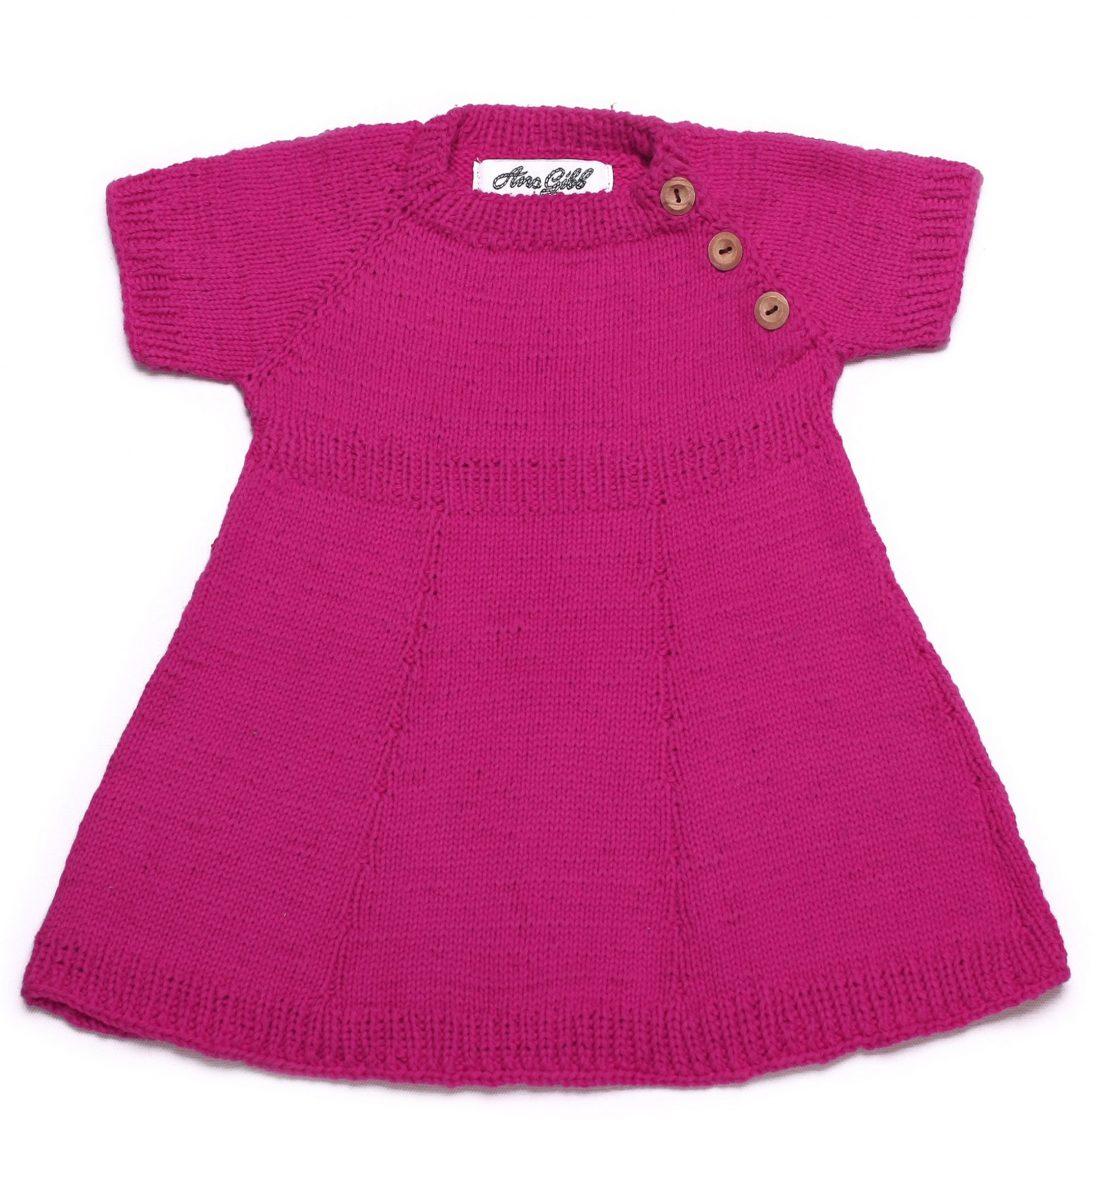 Shortsleeve Cotton Dress 1046 pink